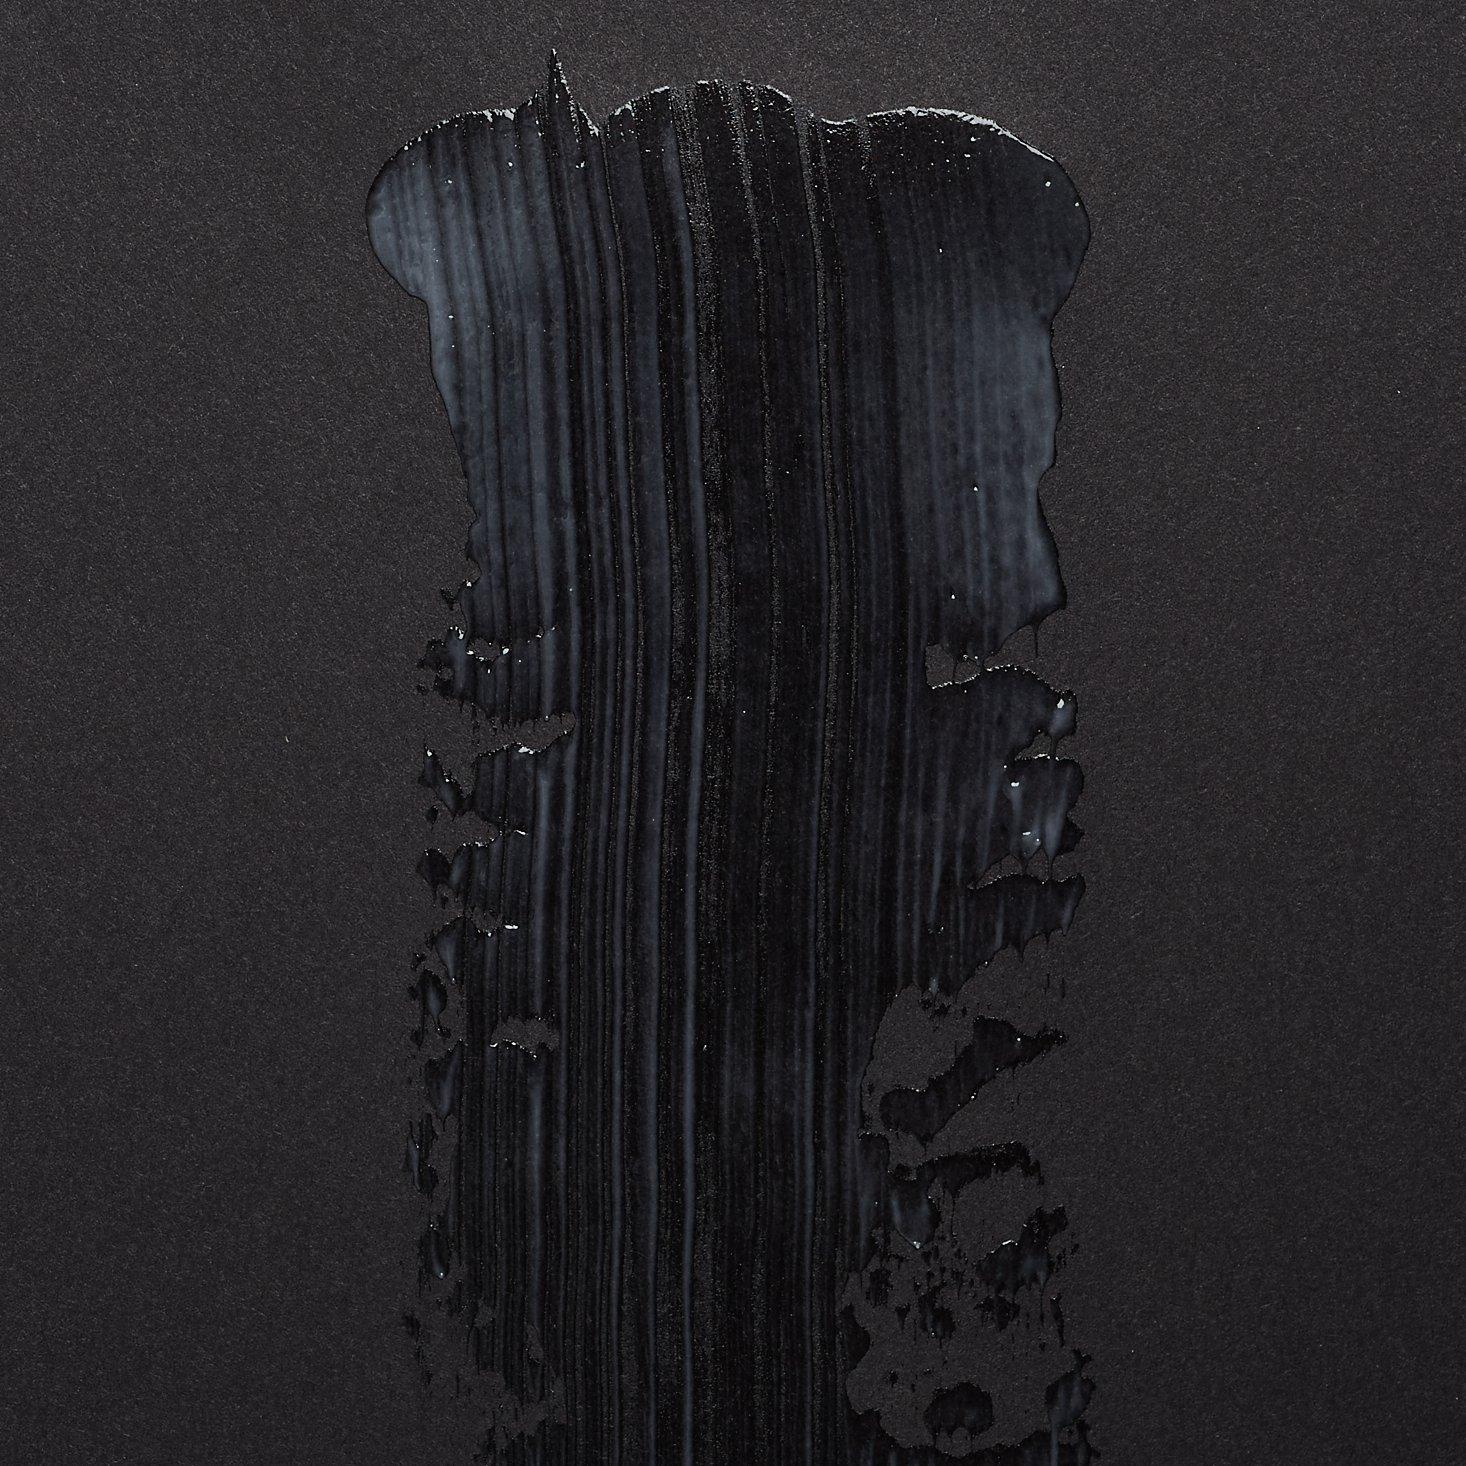 Lume deodorant on black paper.